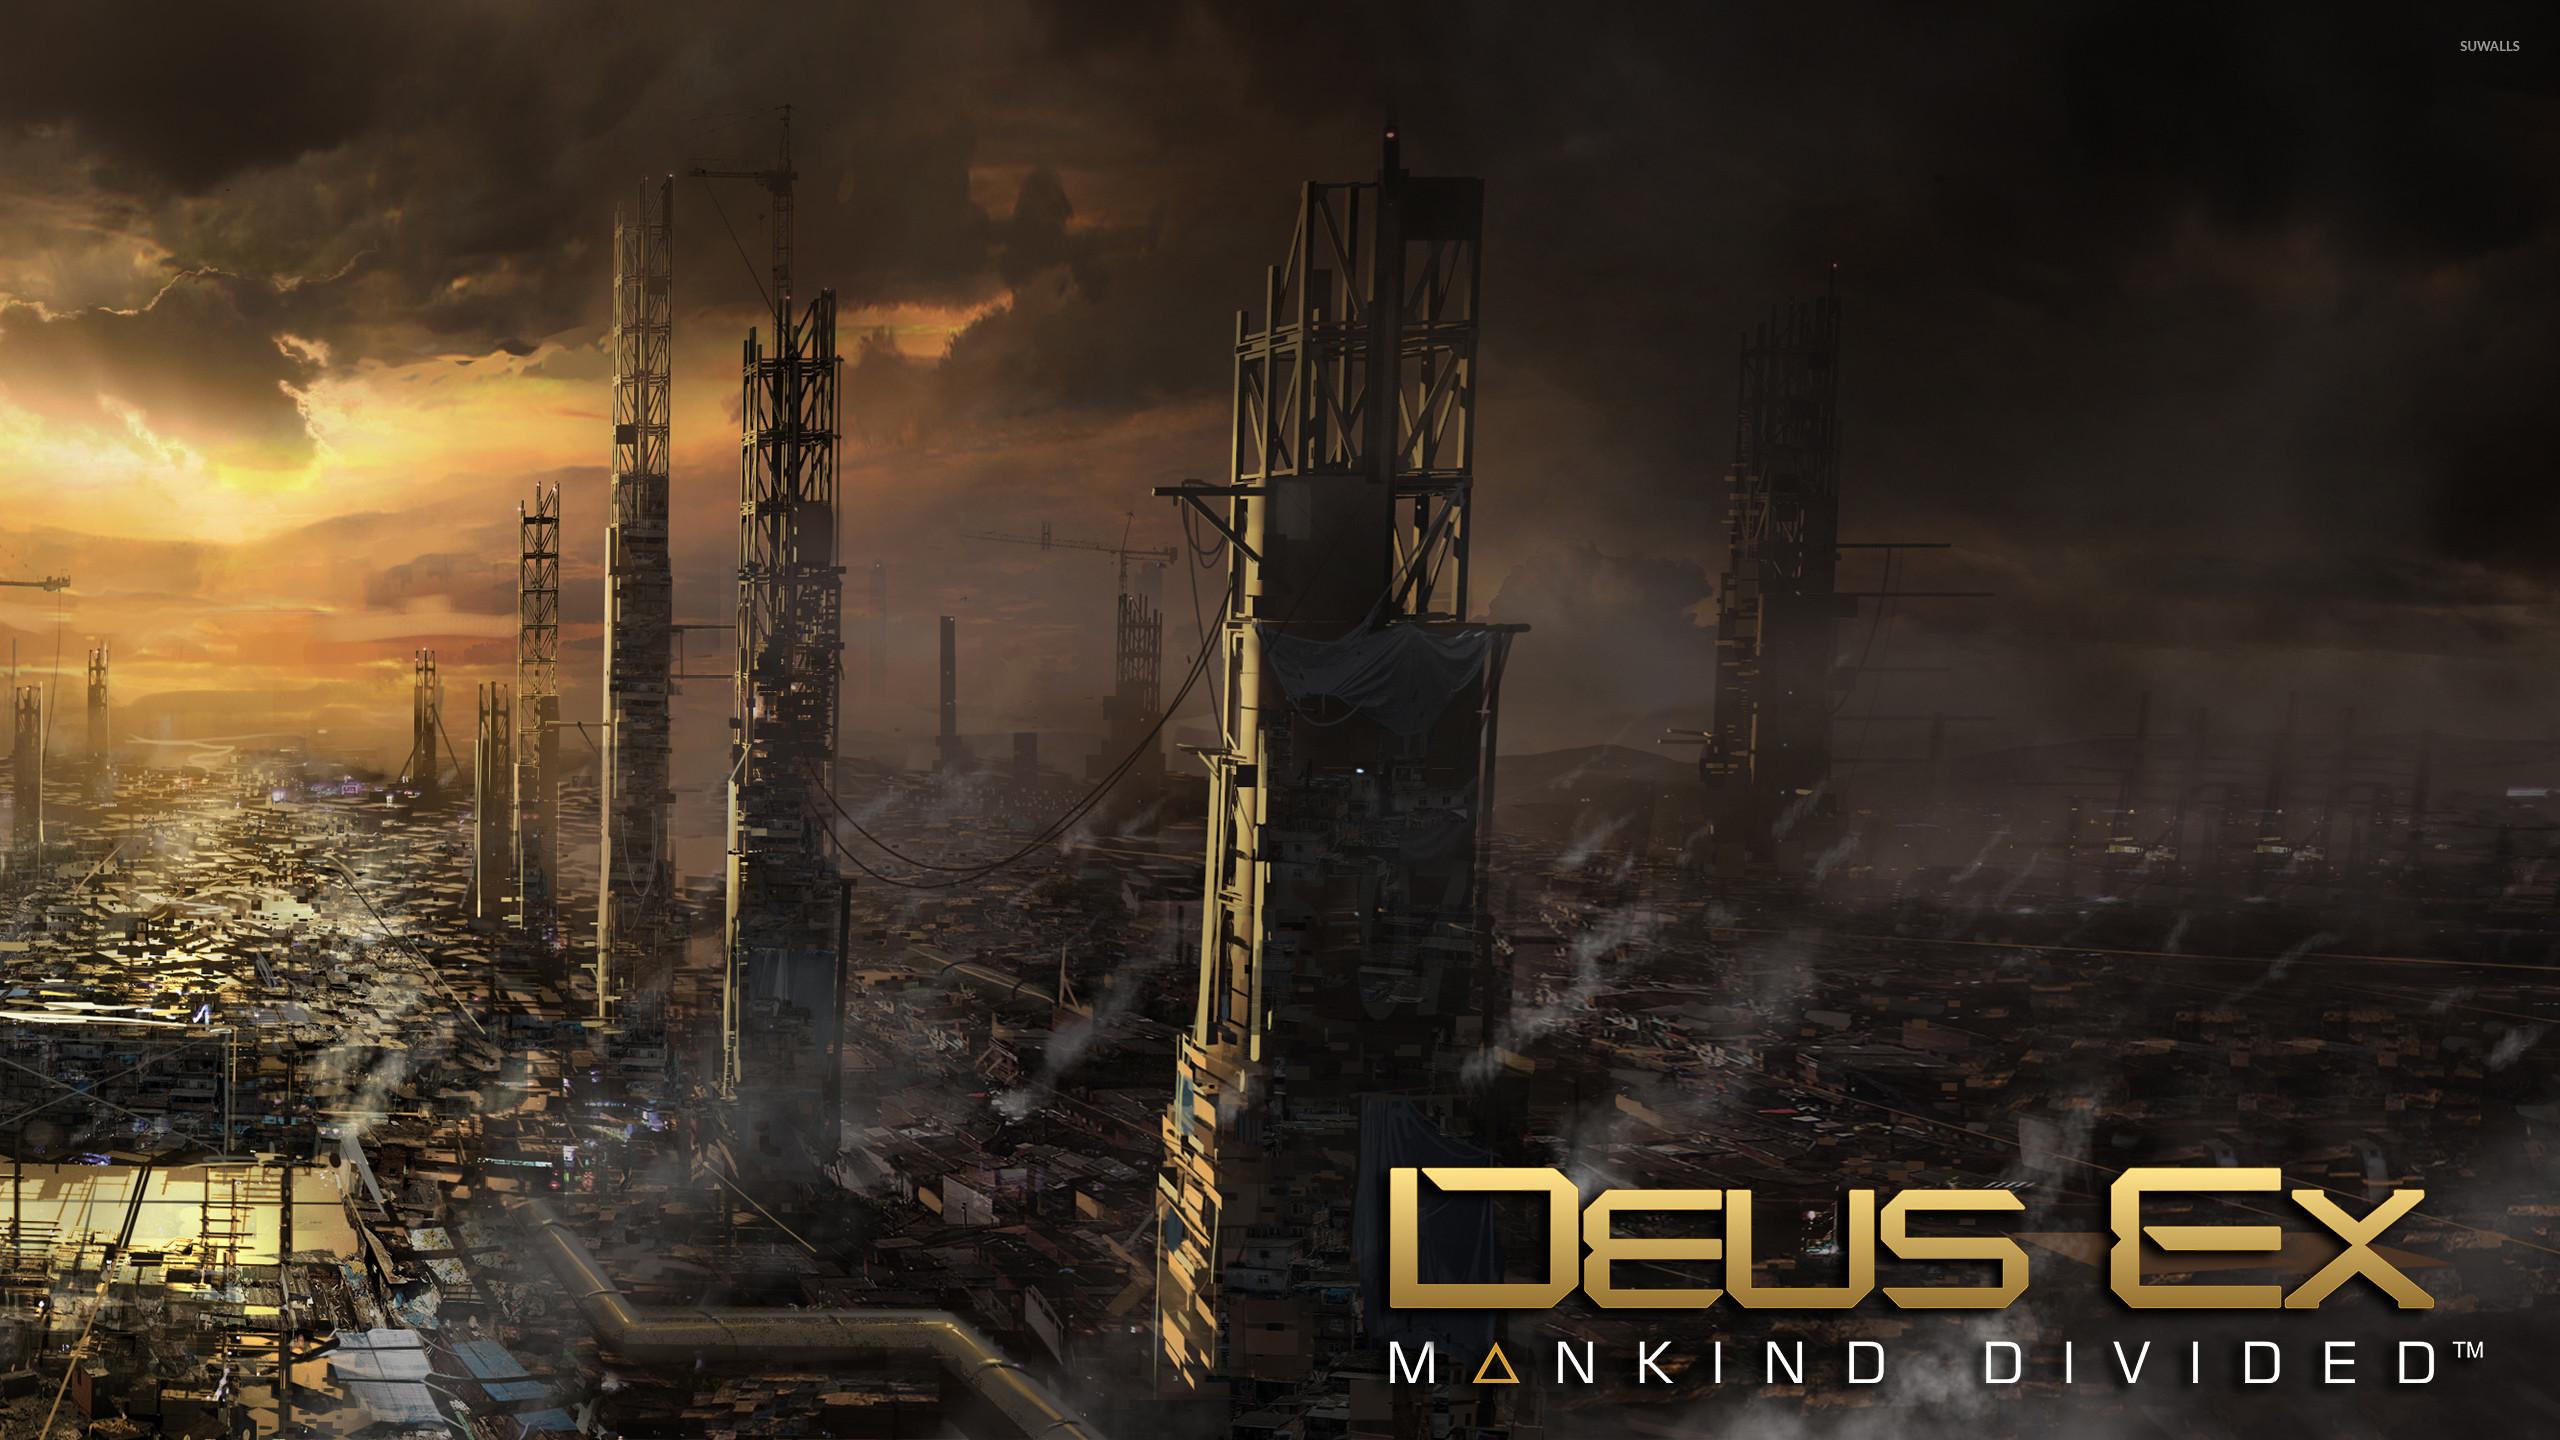 Deus Ex Mankind Divided Wallpaper: Deus Ex Wallpapers (77+ Images